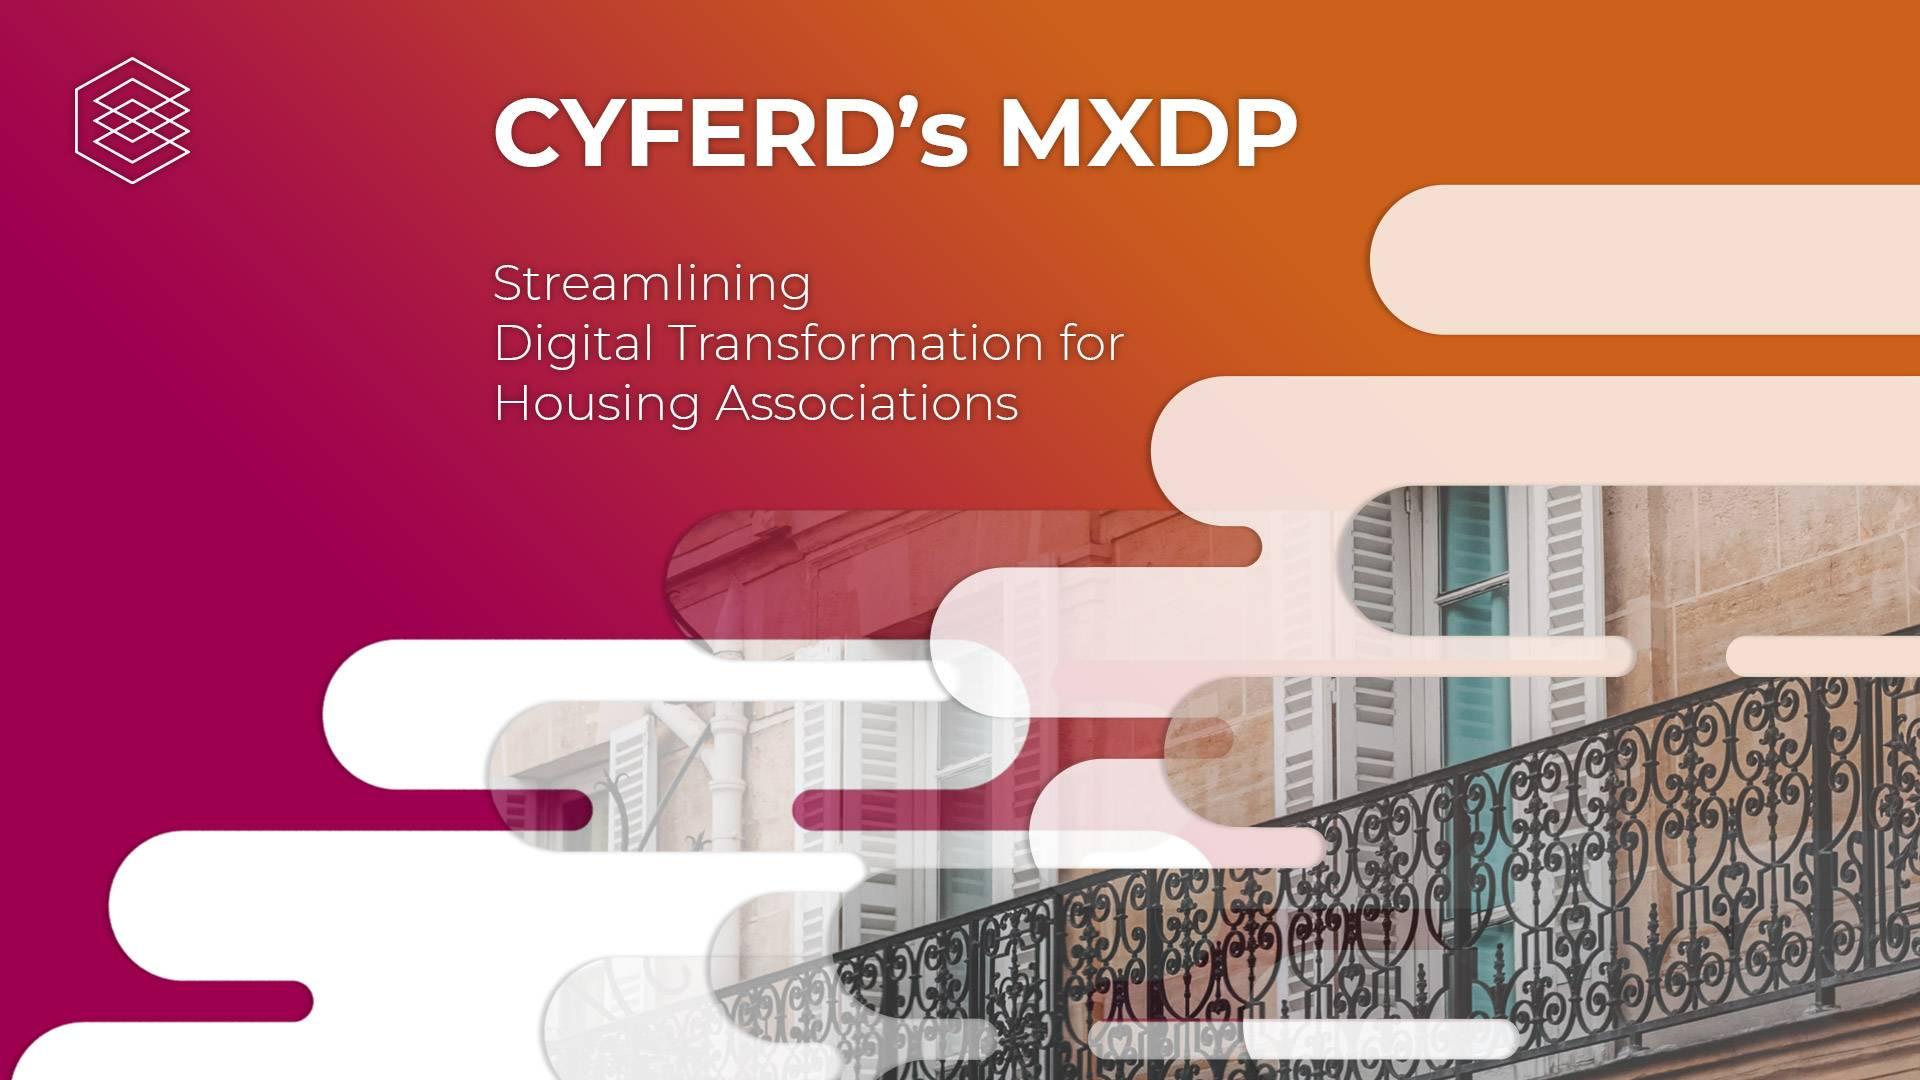 mxdp-tech-for-housing-associations-digital-transformation